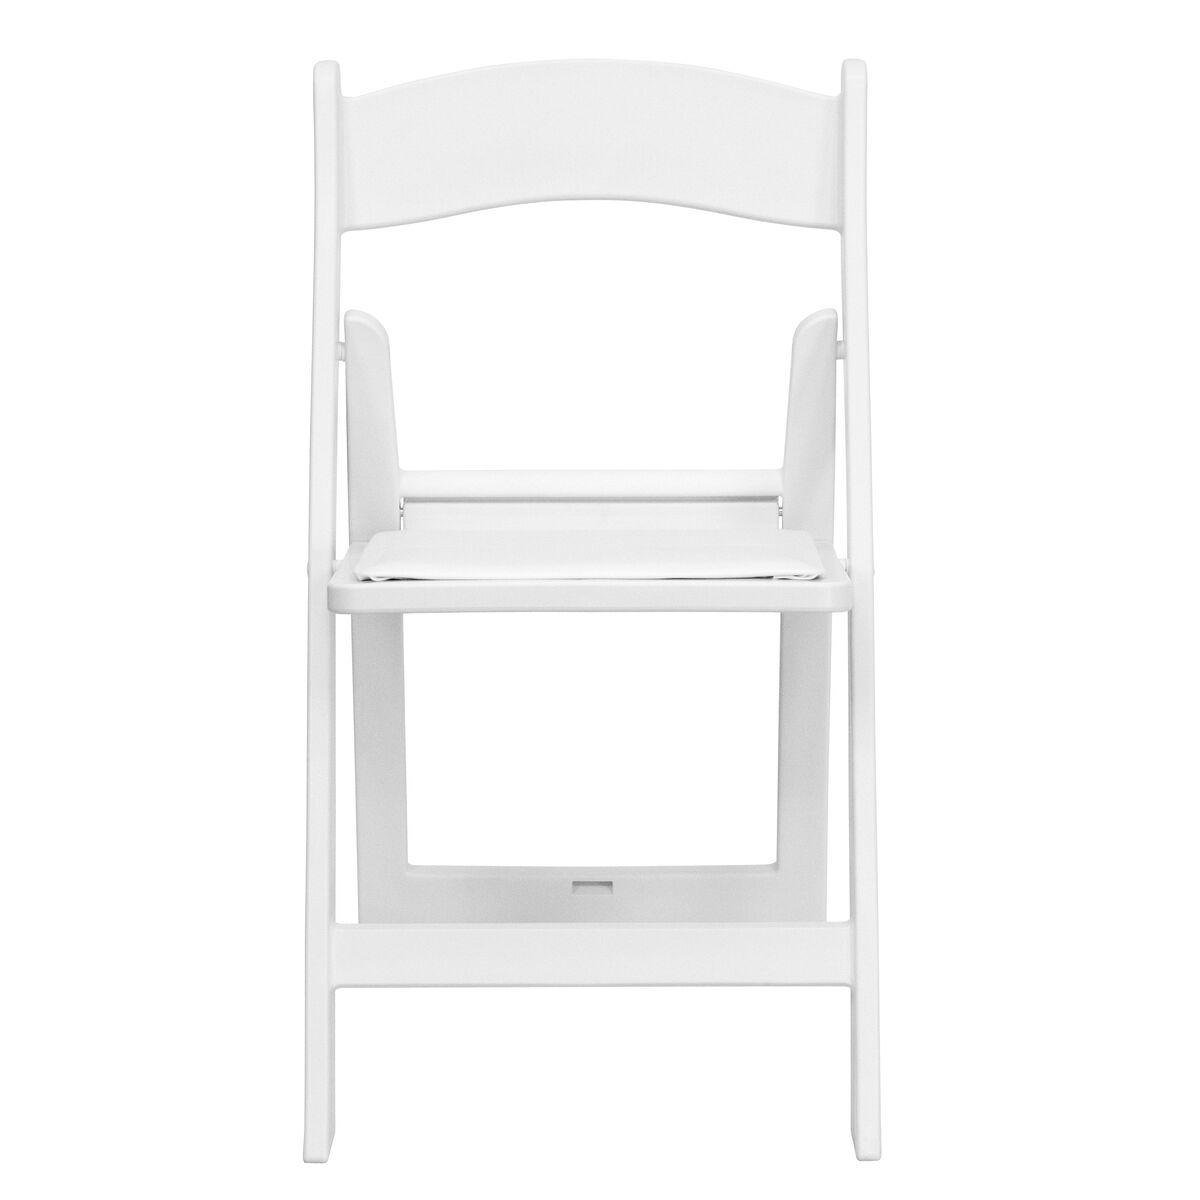 White Resin Folding Chair Le L 1 White Gg Bizchair Com